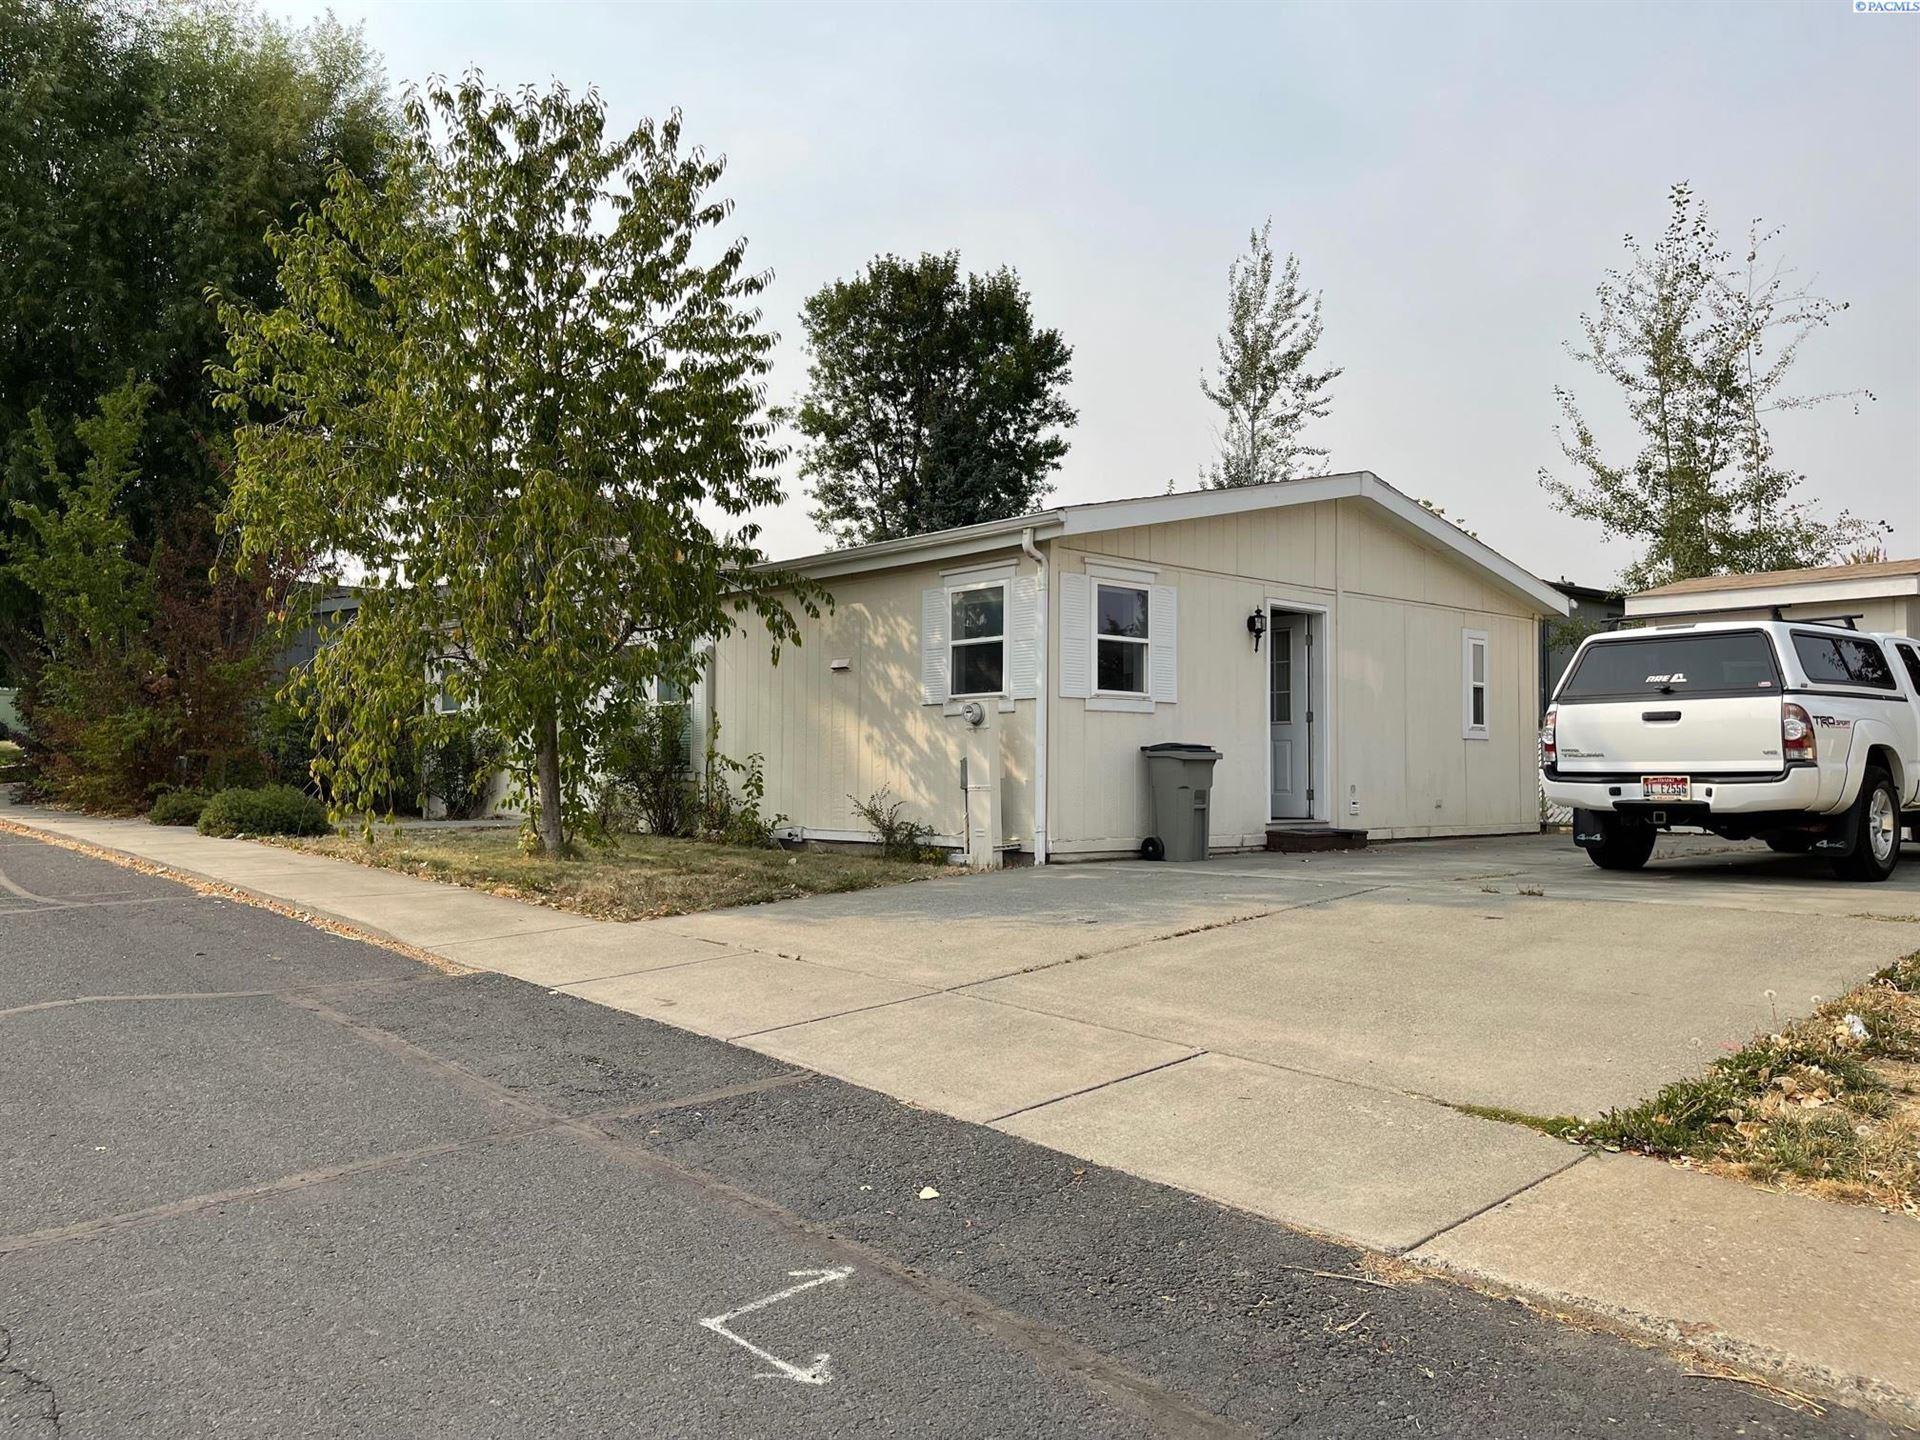 Photo of 118 NW Glenhaven Dr, Pullman, WA 99163 (MLS # 256352)